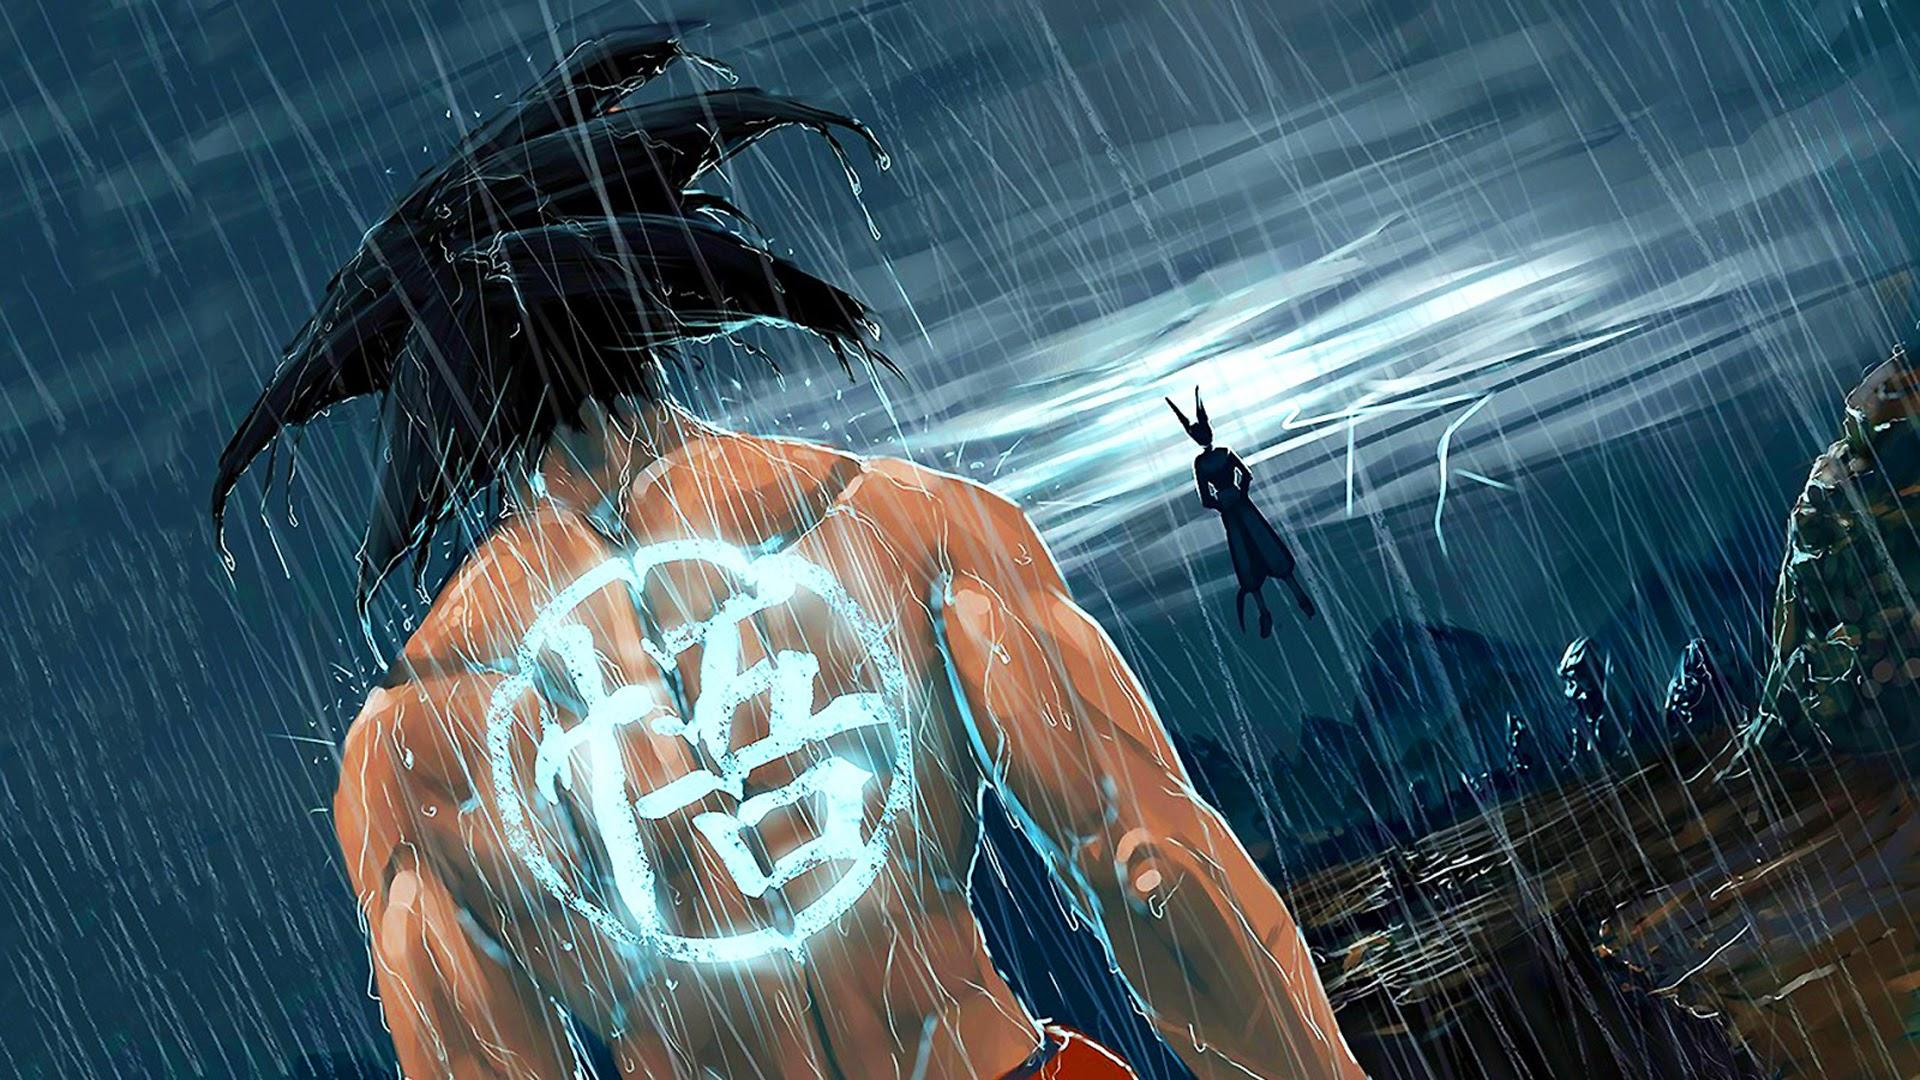 son goku dragon ball battle of gods hd wallpaper raining 1920x1080 1920x1080